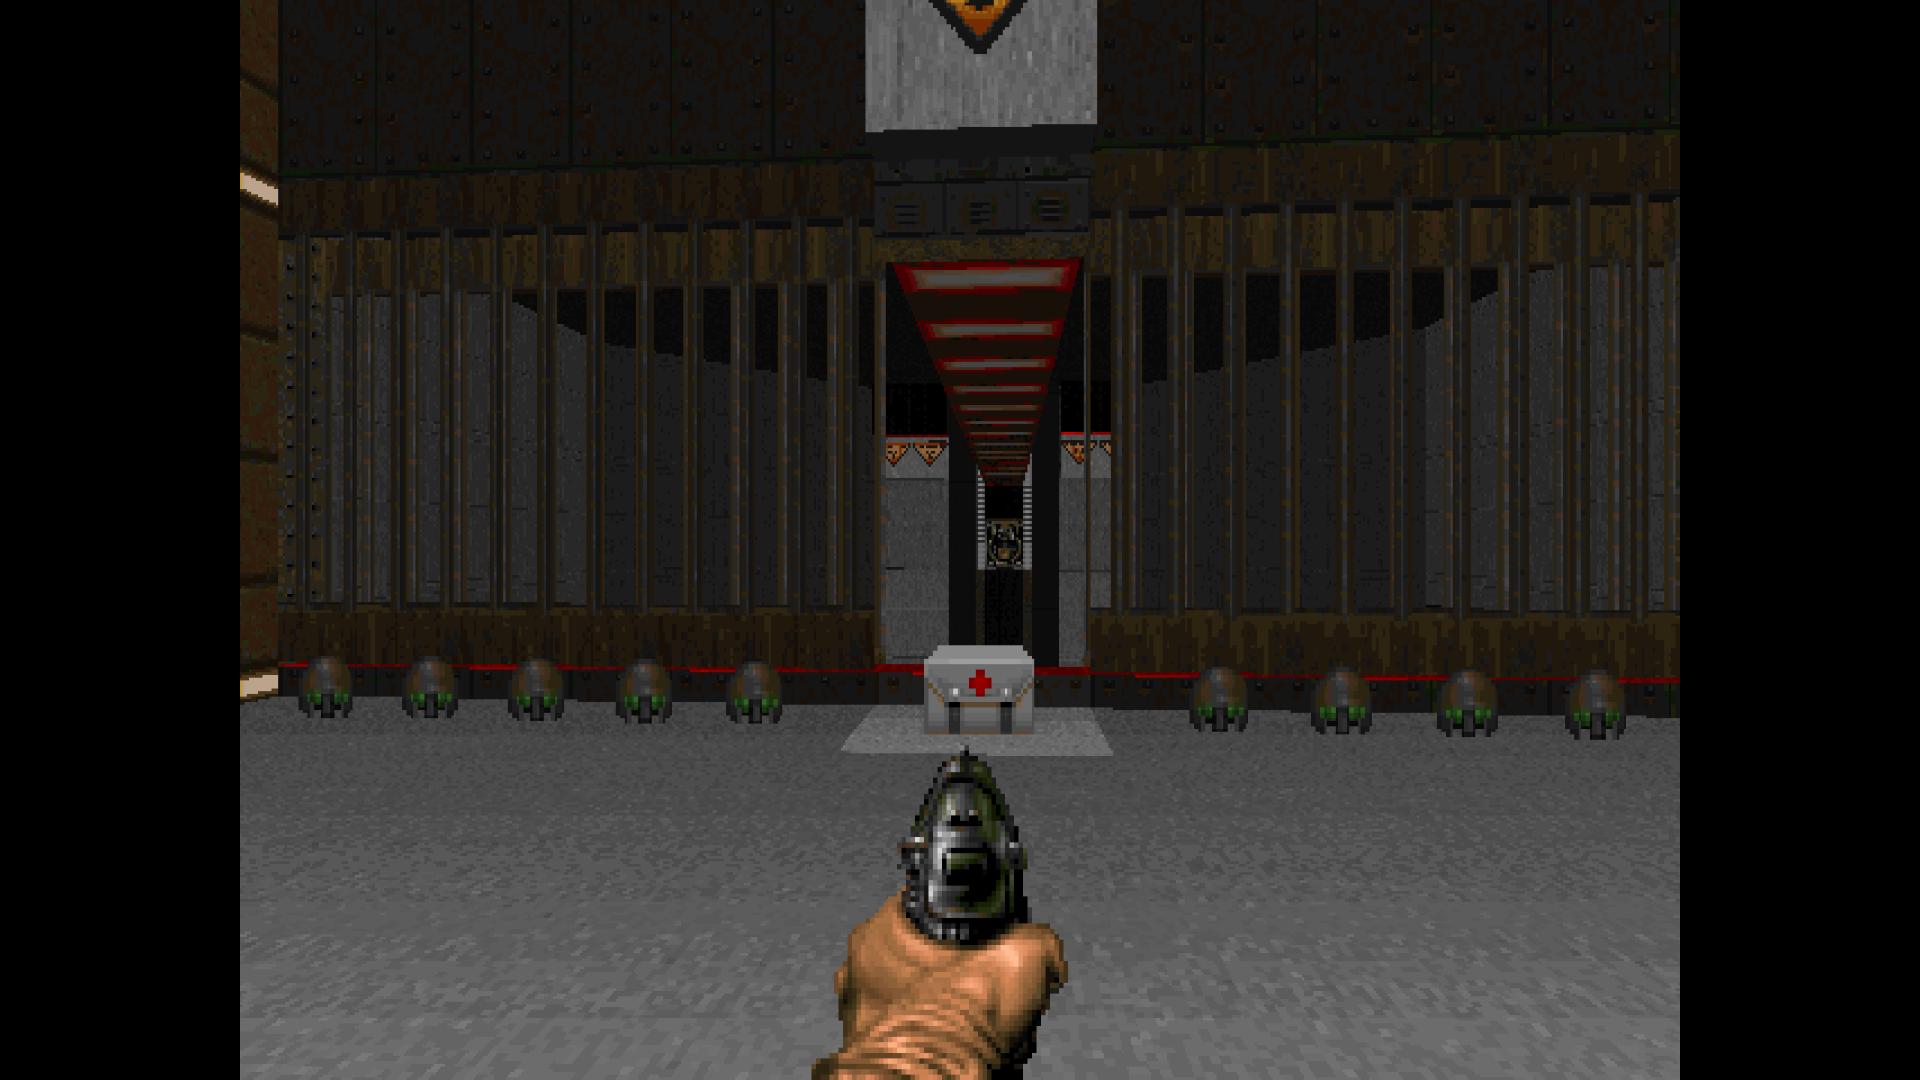 Processing Plant Screenshot 5.png